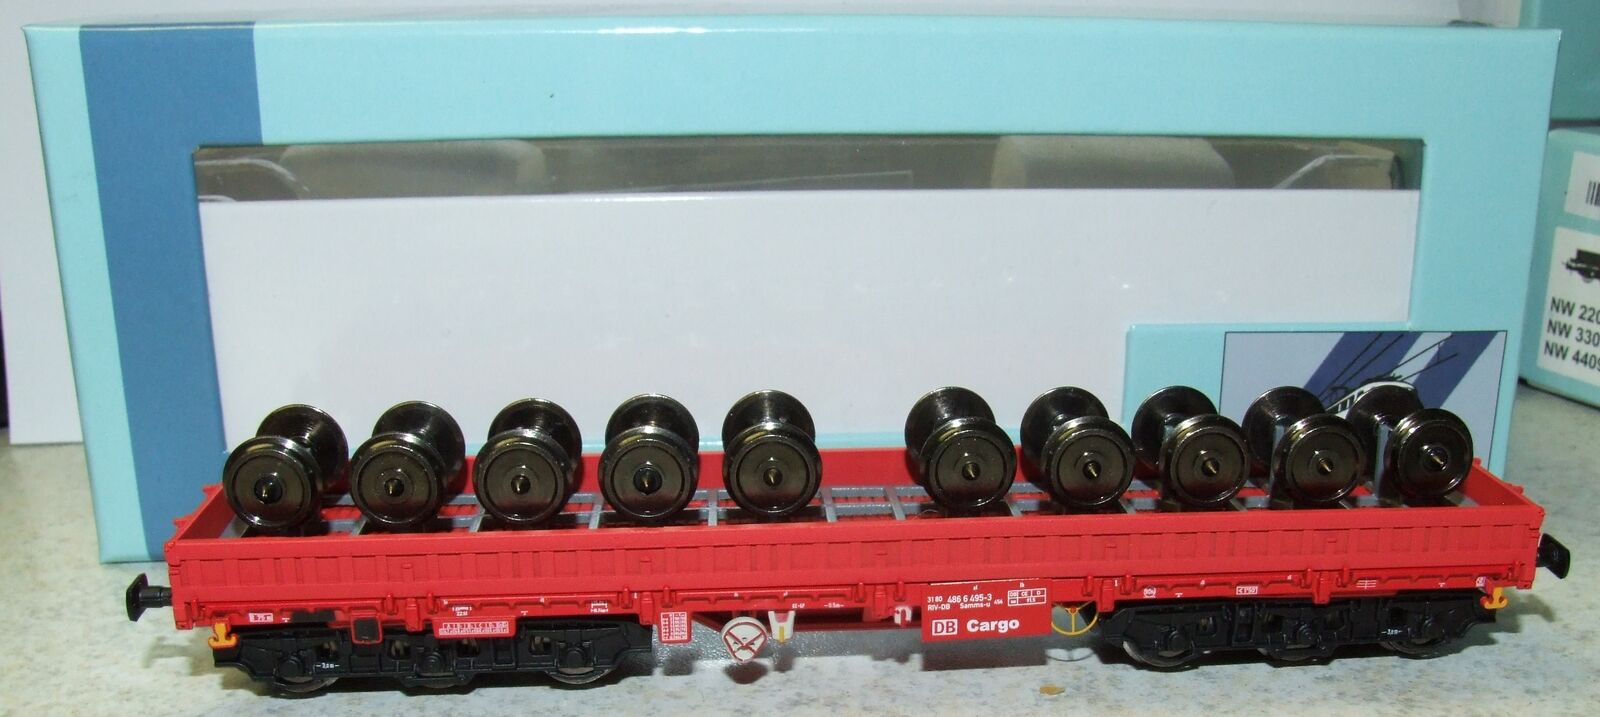 NPE 22075 ruota carrello trasporto Samms U 454 DBAG DC